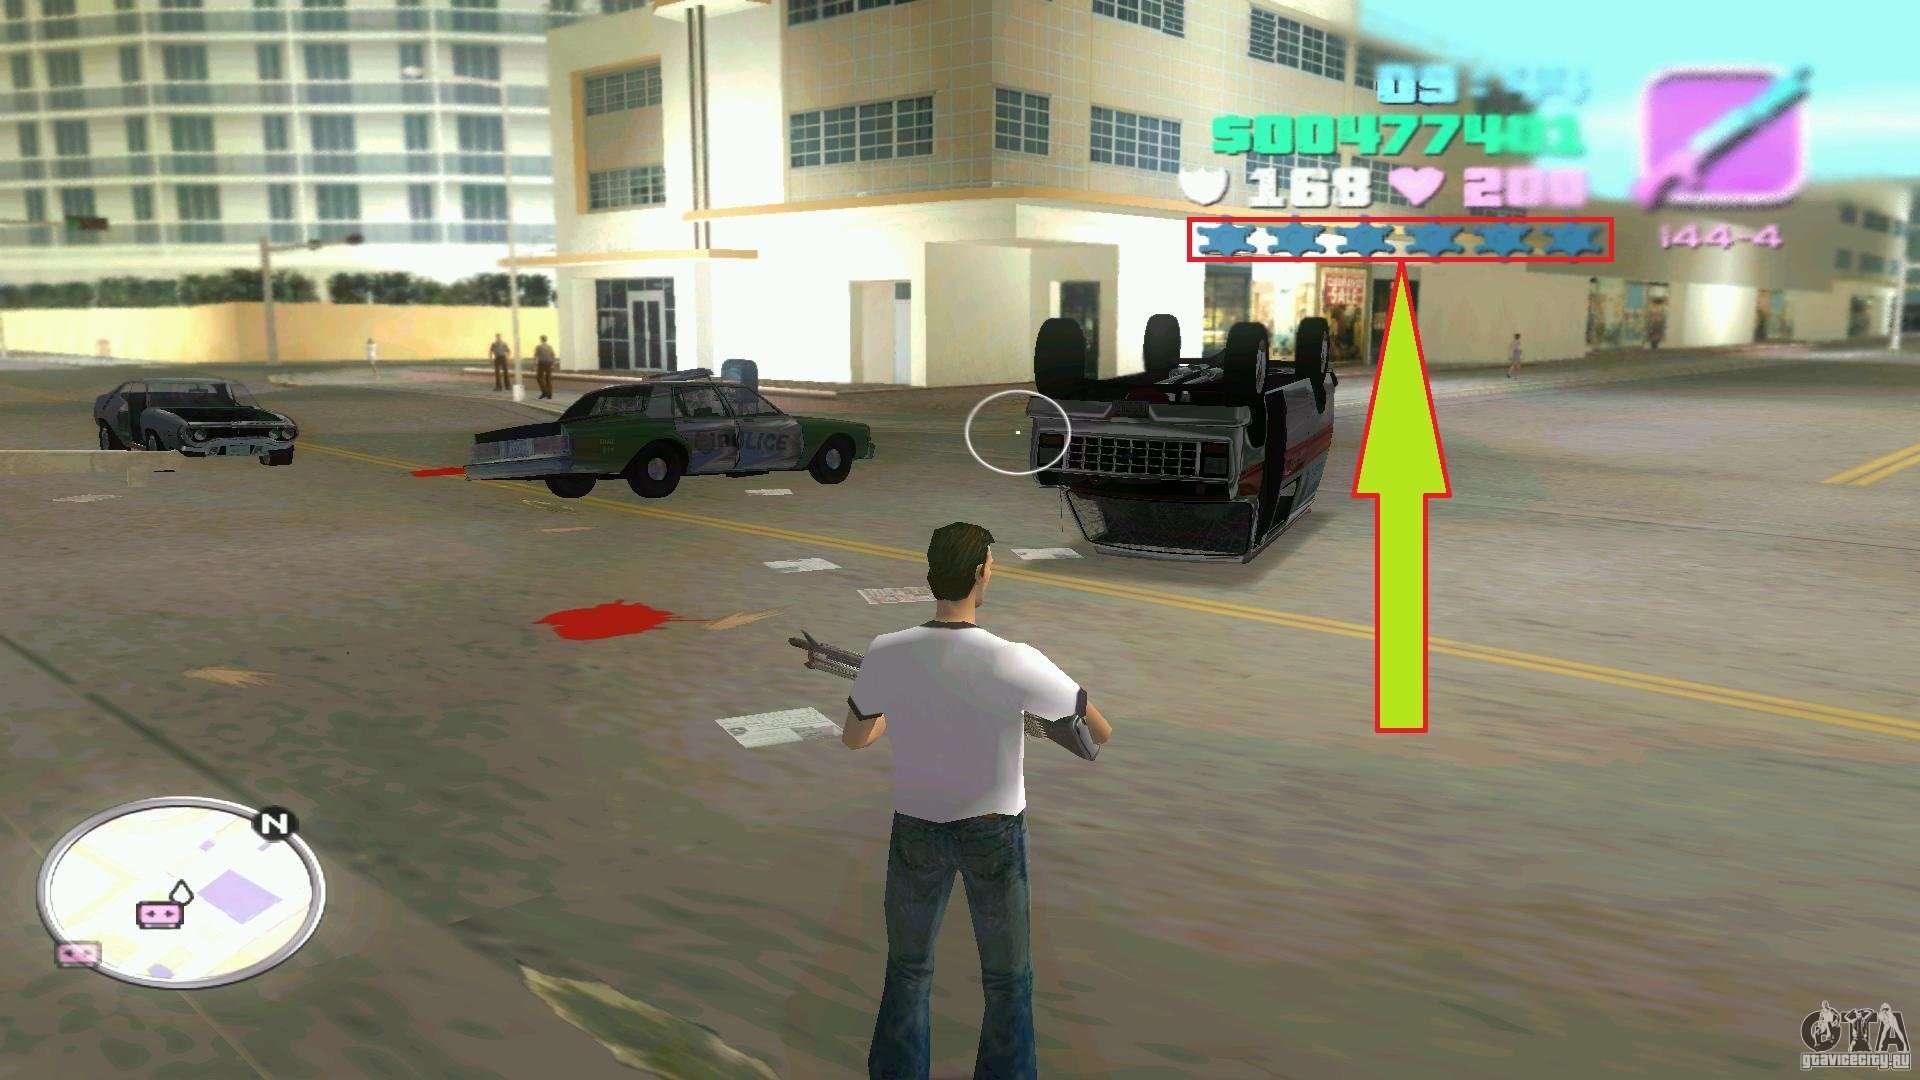 The GTA Place - Vice City PC Cheats